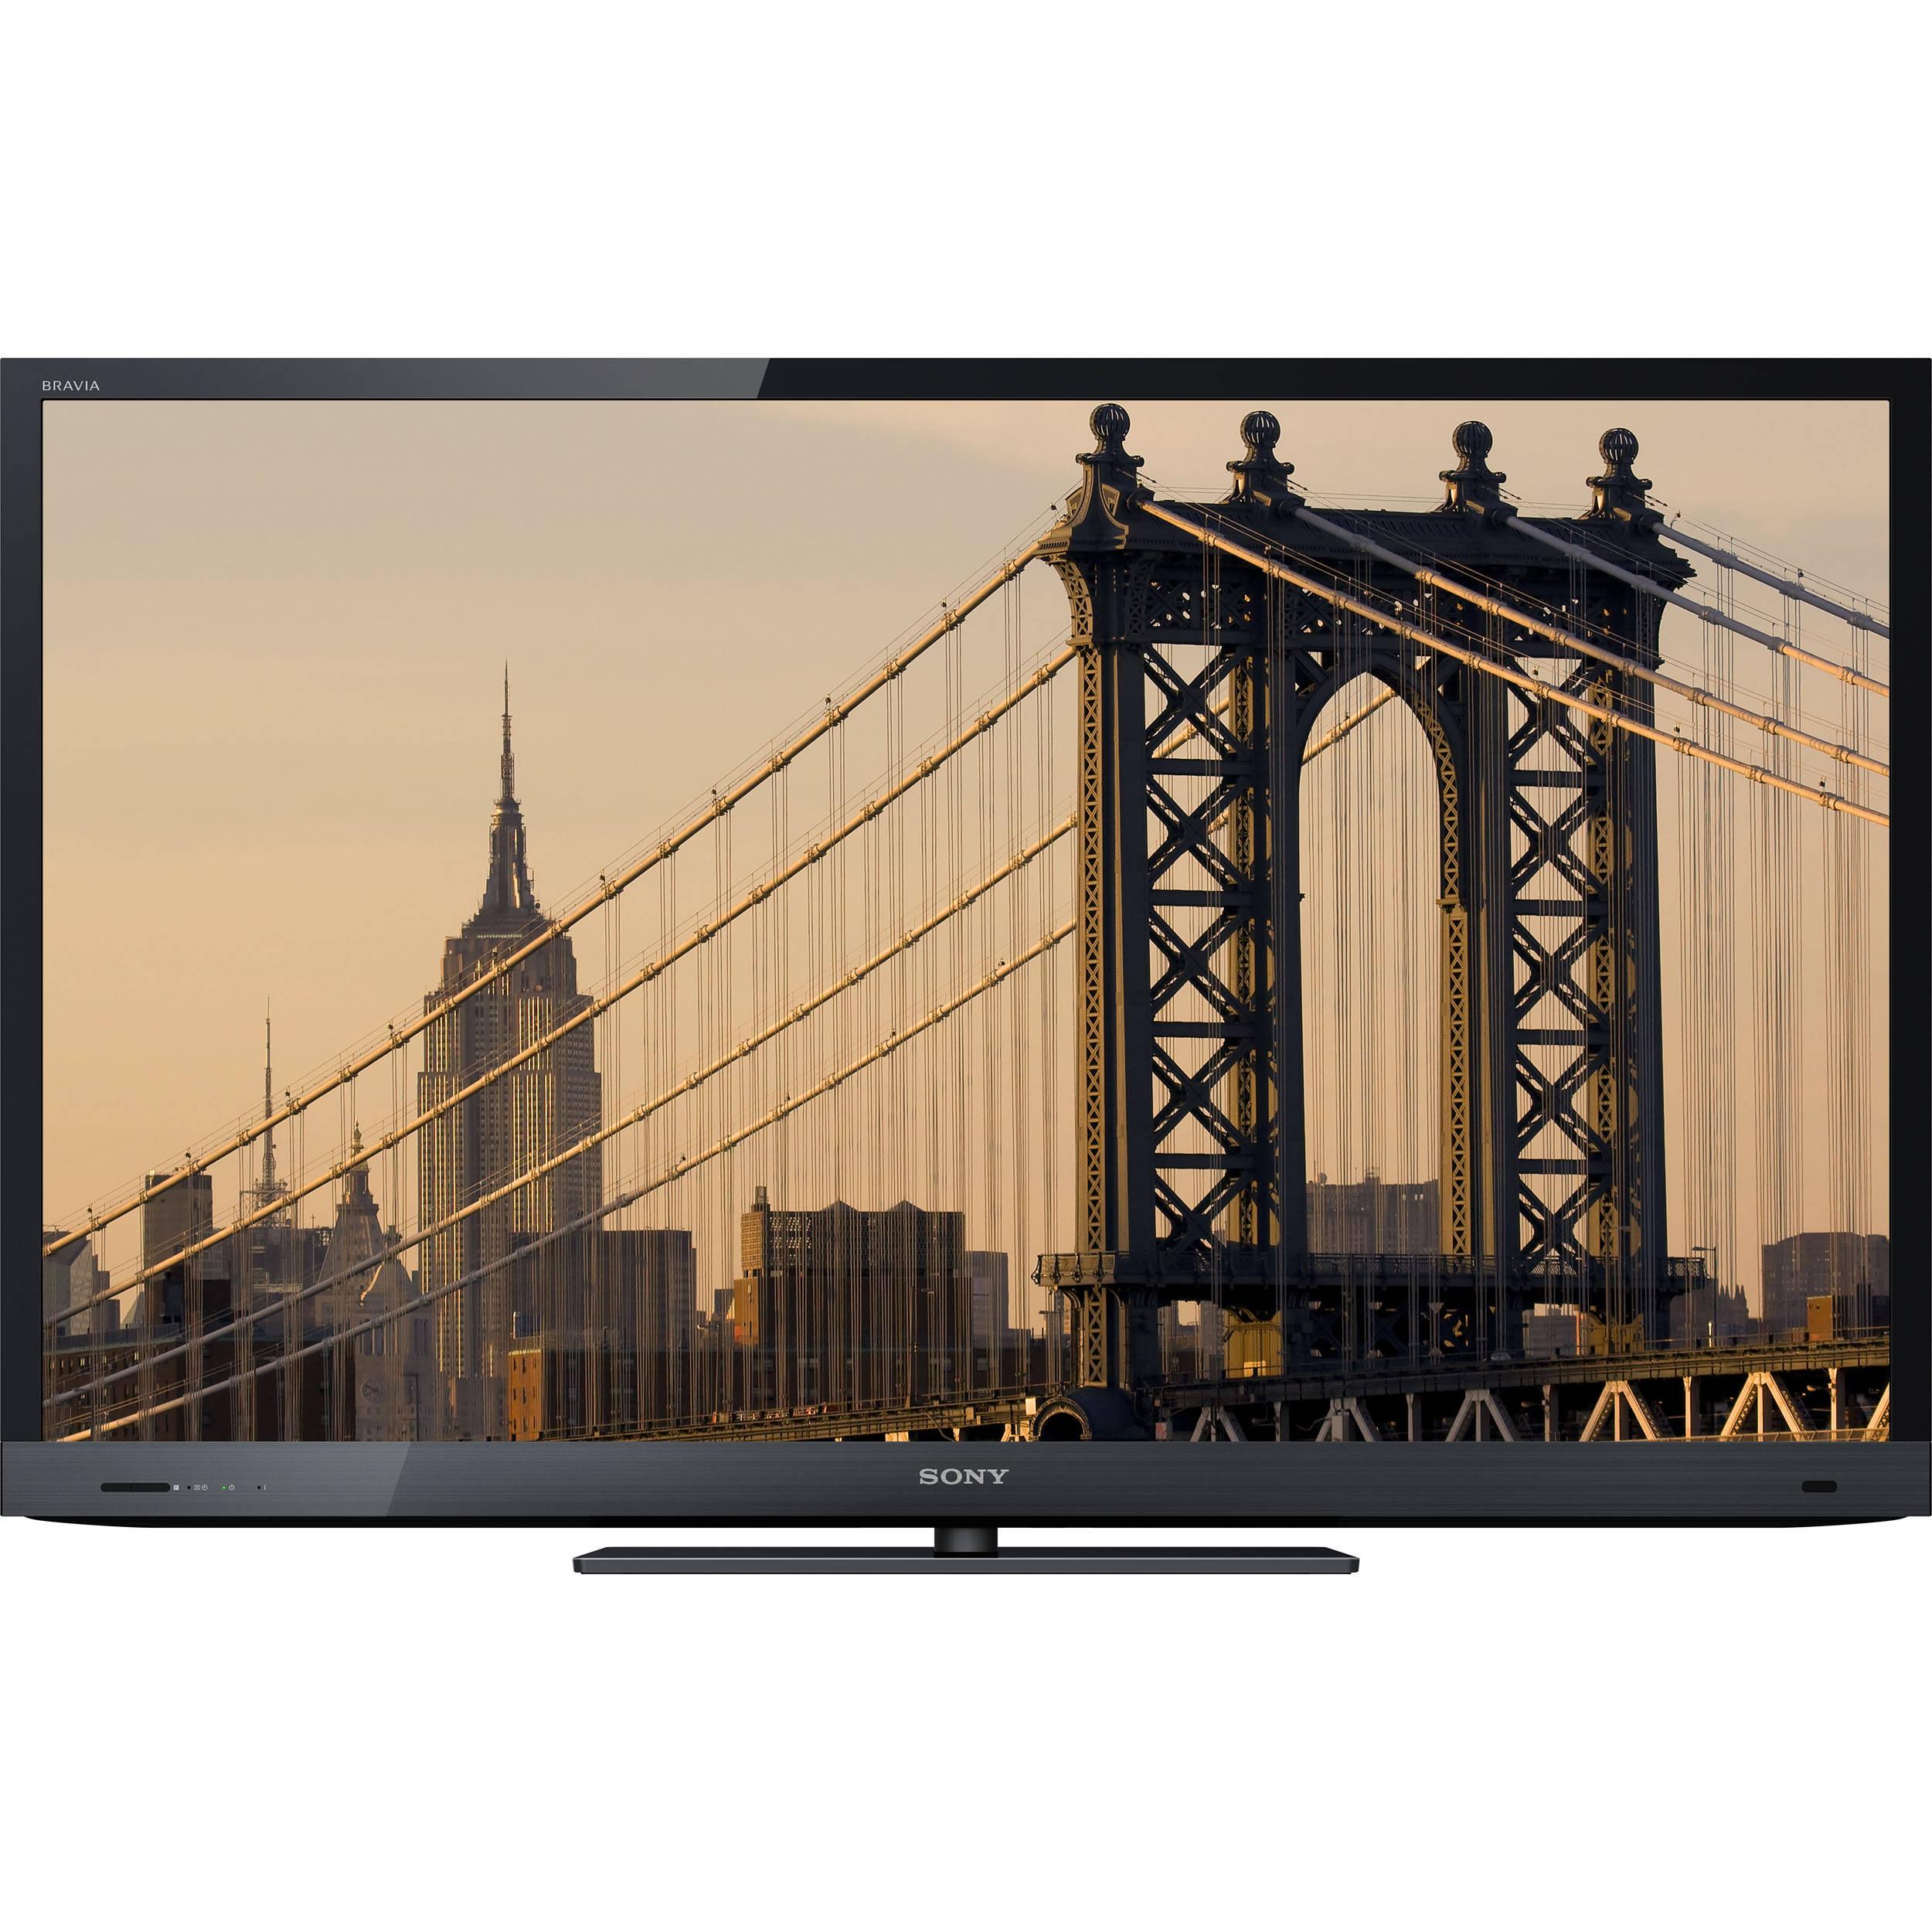 Sony KDL-60EX720 BRAVIA HDTV Drivers (2019)